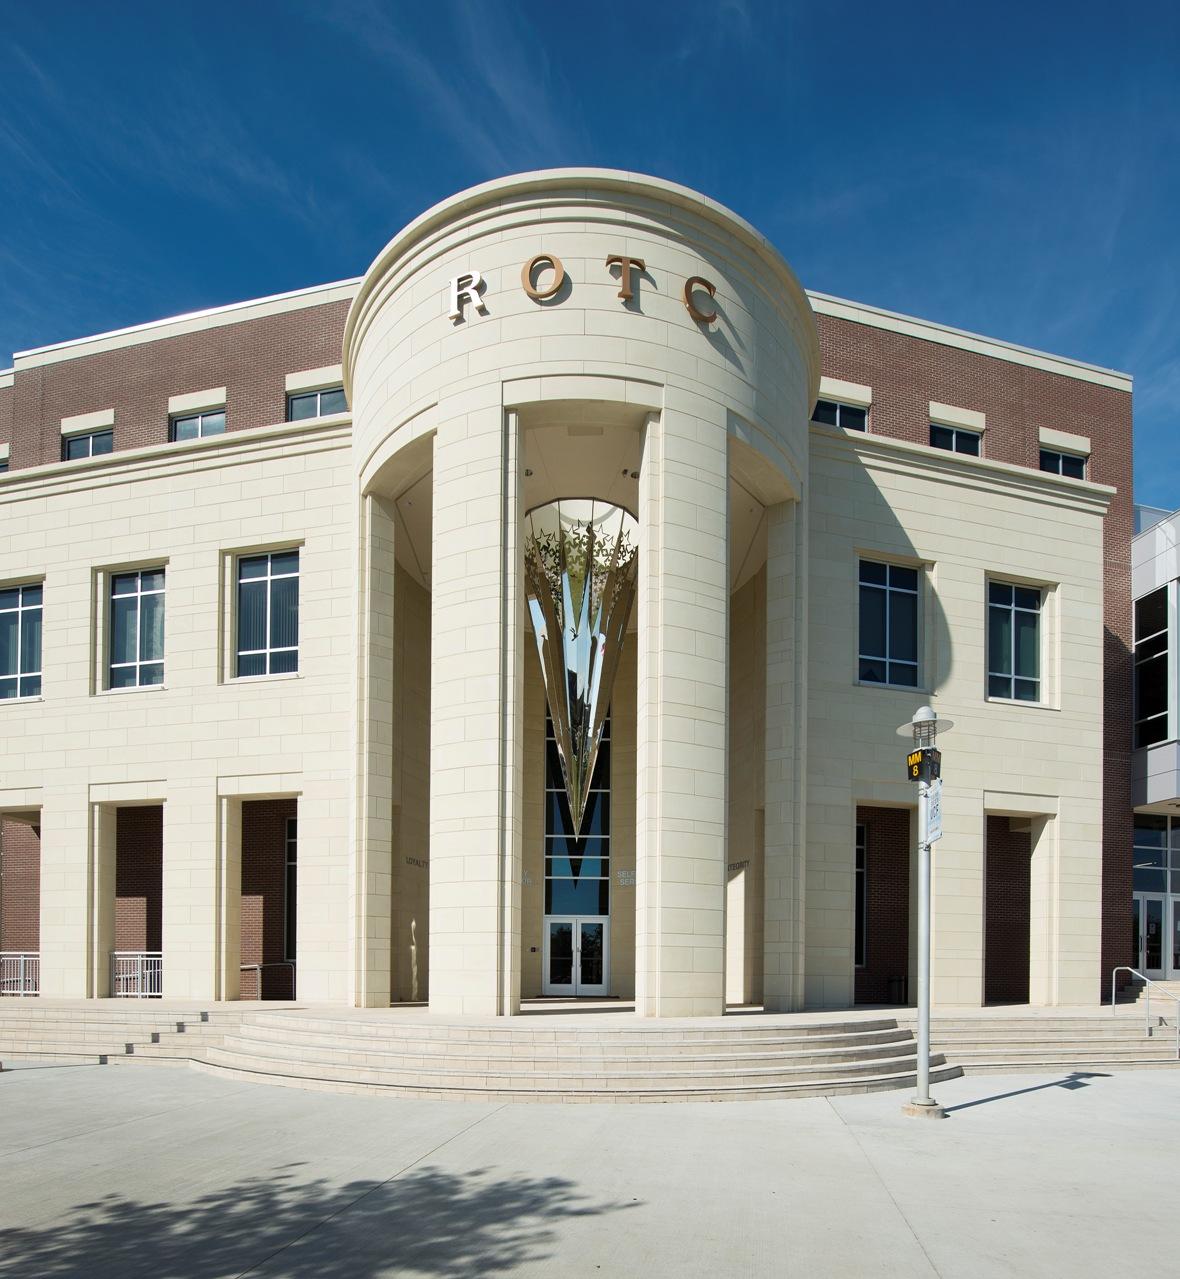 AAS 2014 CSI Award   ROTC Classroom # 2   Materials Used: Architectural Precast, Cast Stone   Schenkel Shultz, Architecture/ Interior Design